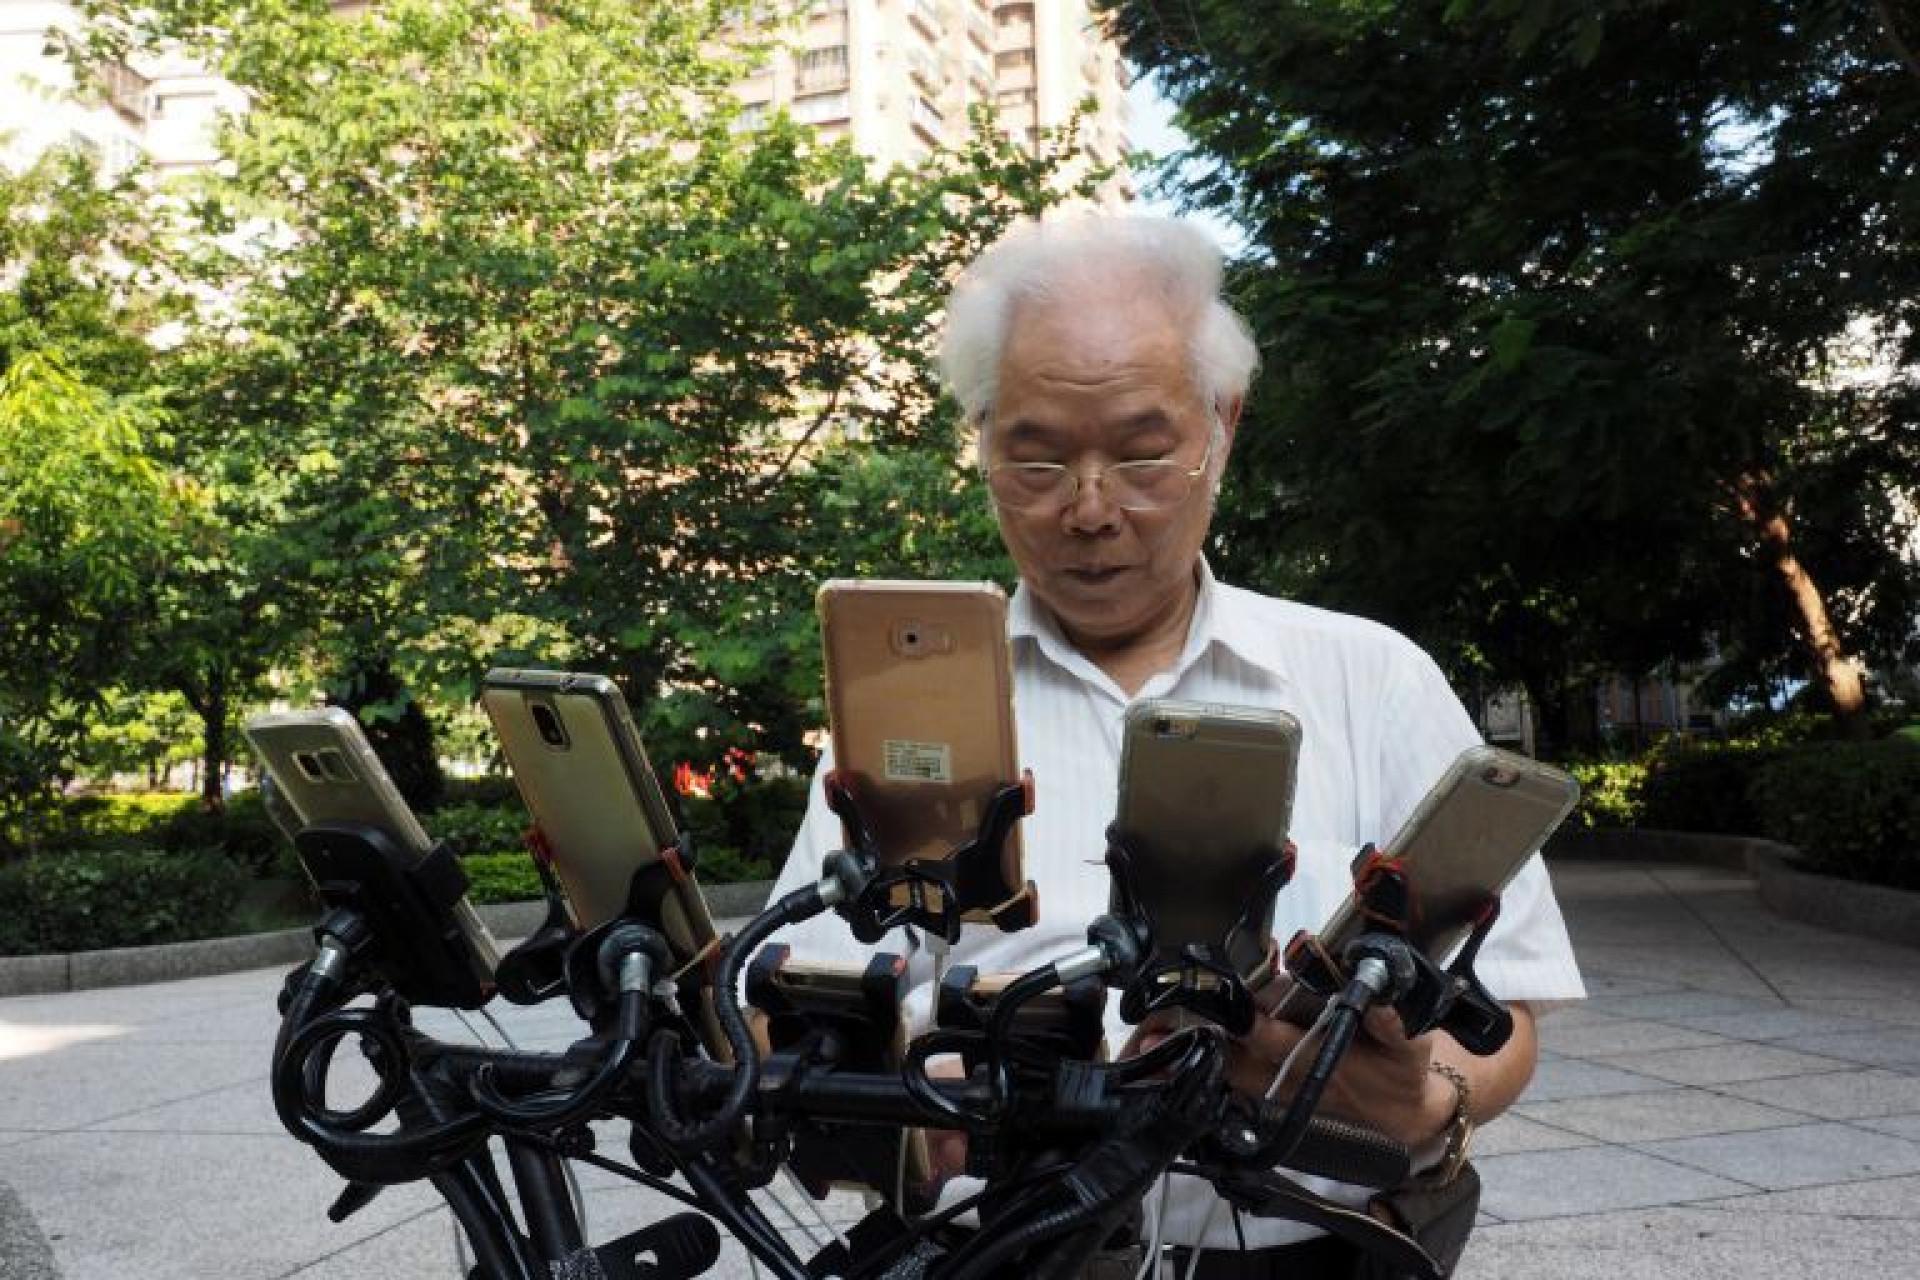 O 'Tio Pokémon' usa 11 telemóveis para apanhar pokémons